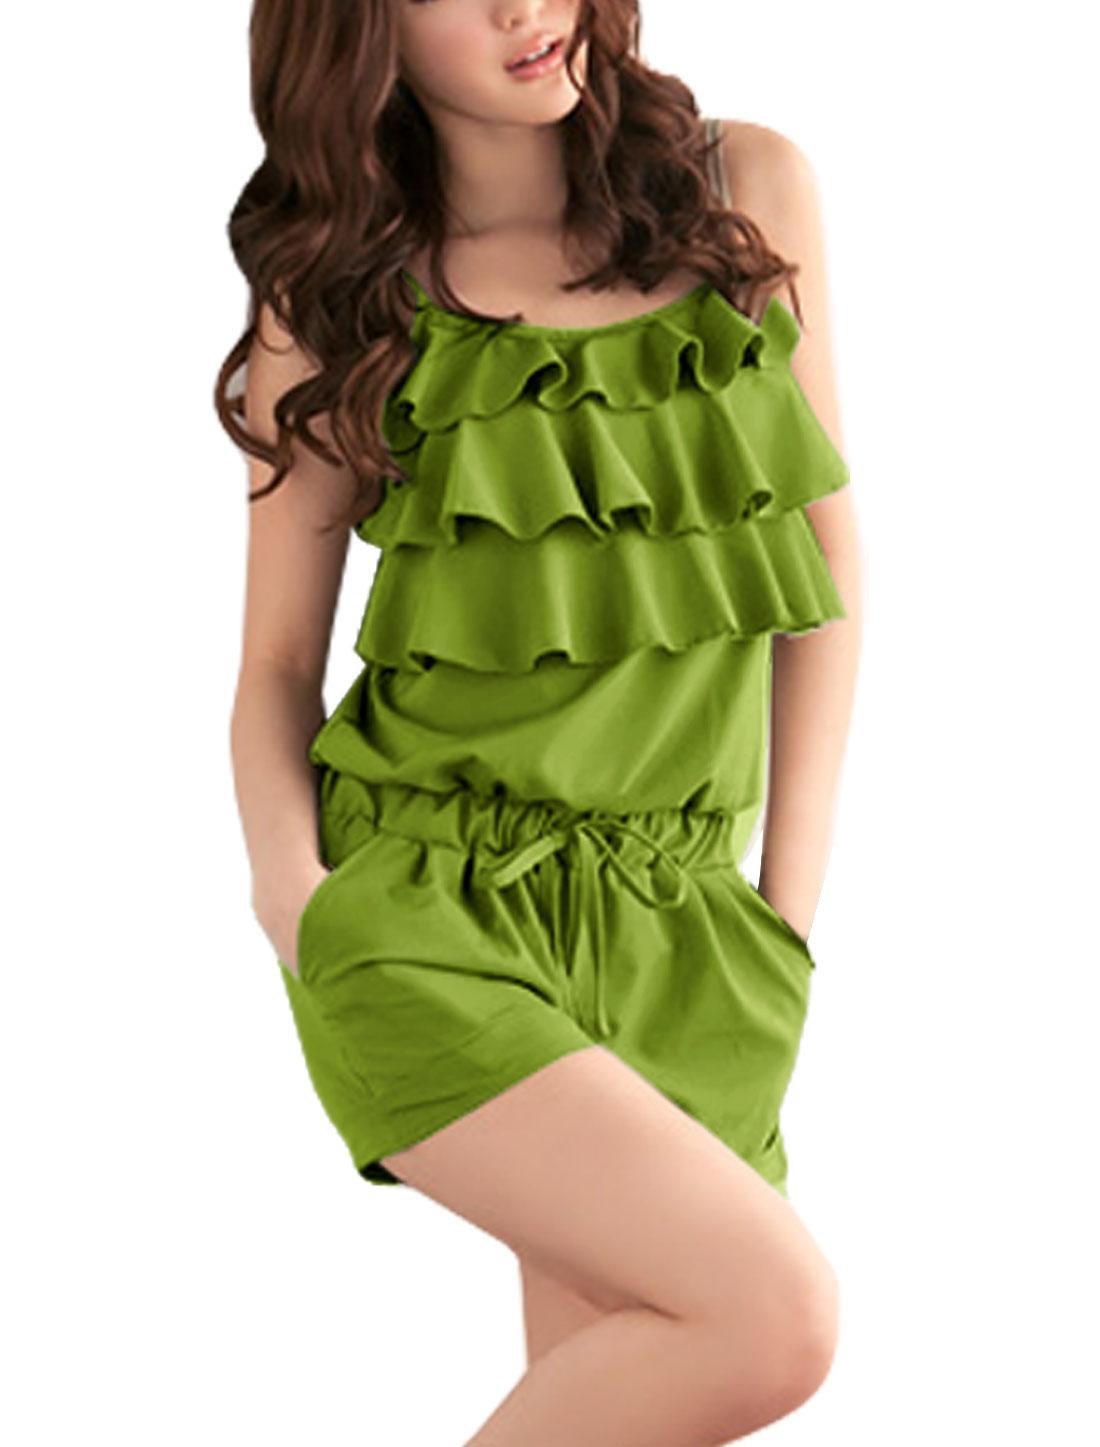 Ladies Drawstring Elastic Waist Sleeveless Green Romper 1X